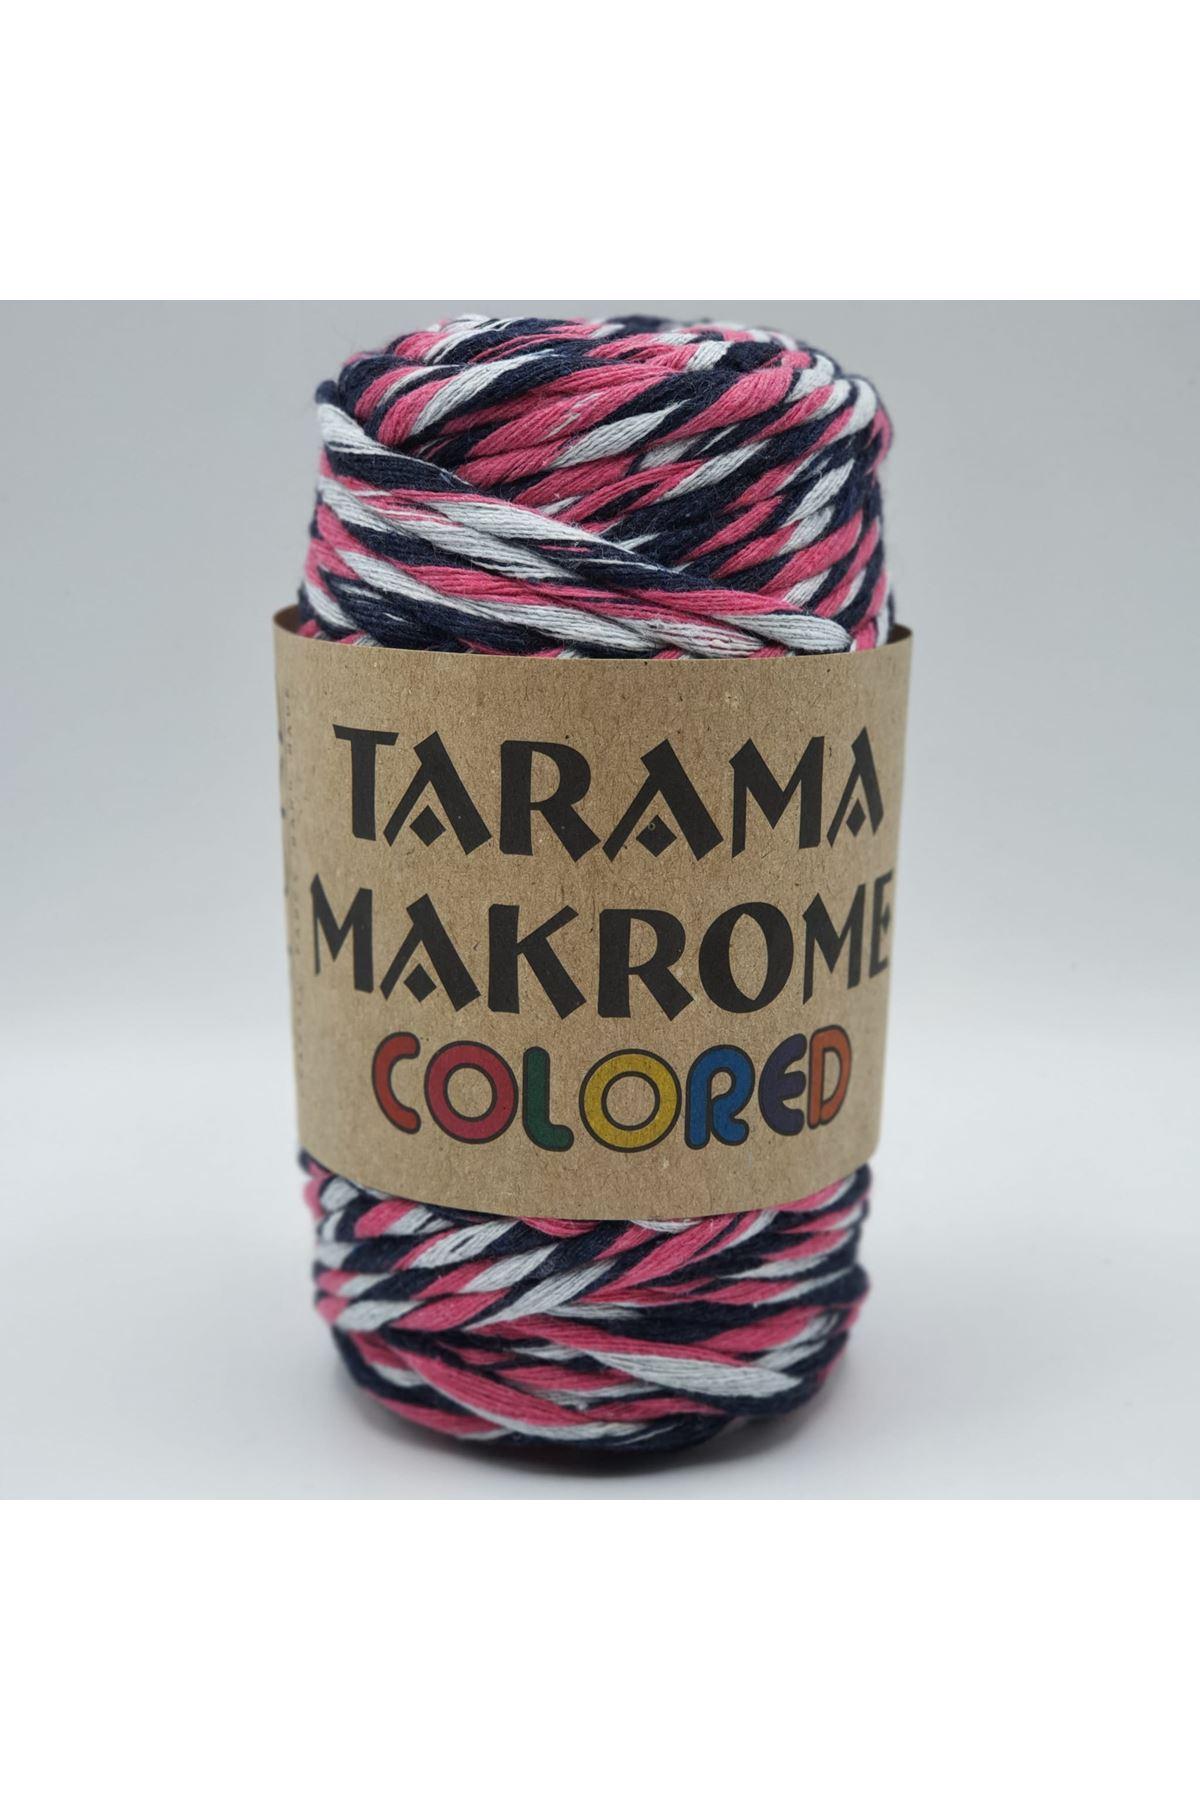 Tarama Makrome Colored 5 mm - 12